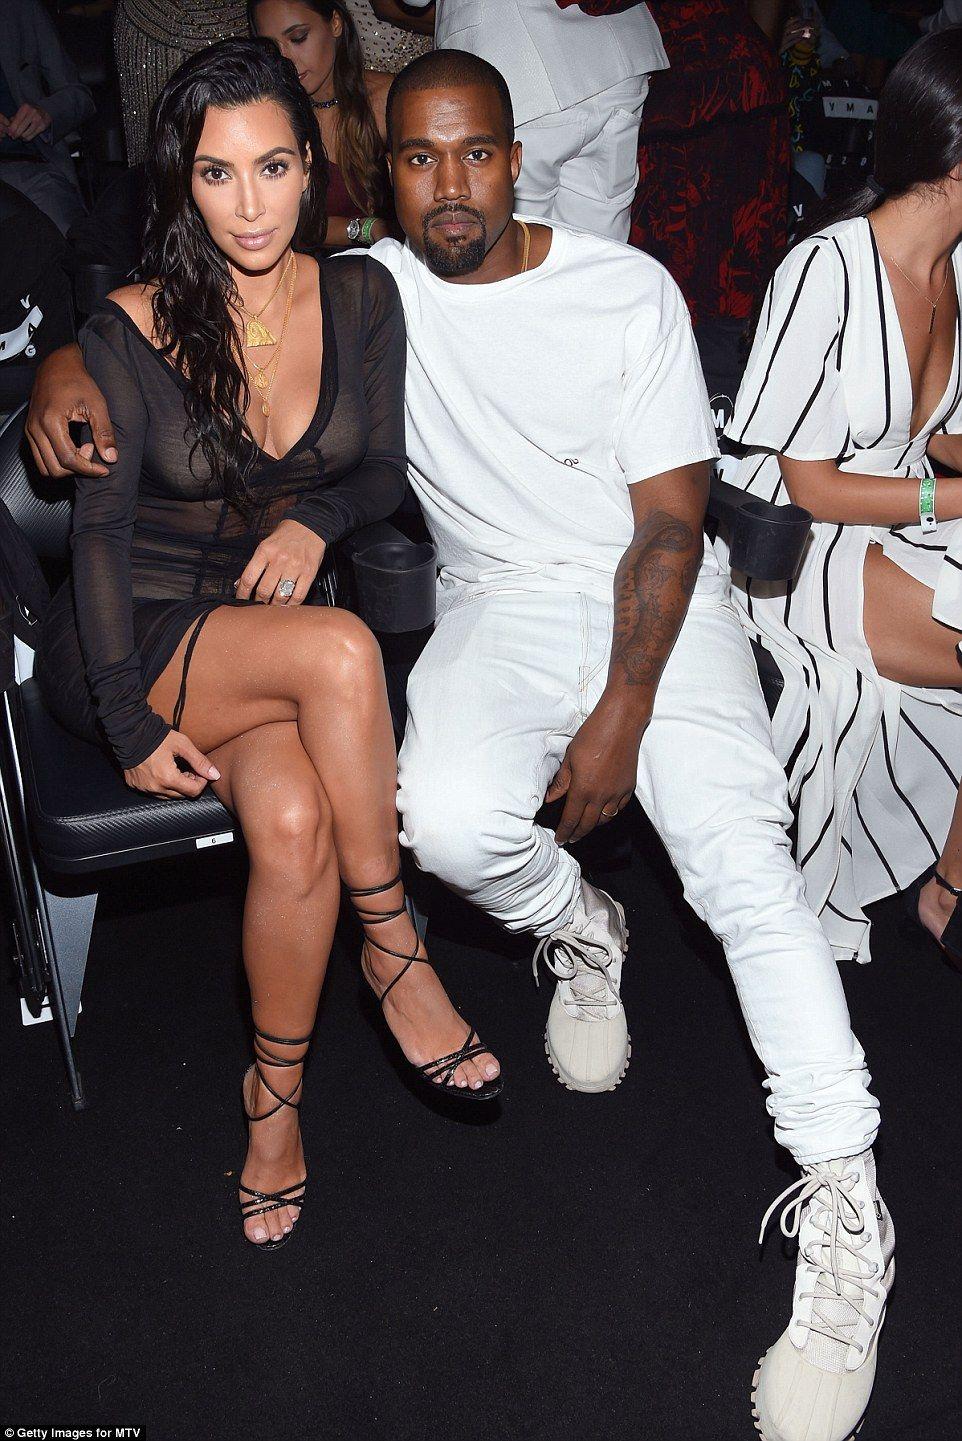 Hacks uk elle off kim kardashians thighs photos